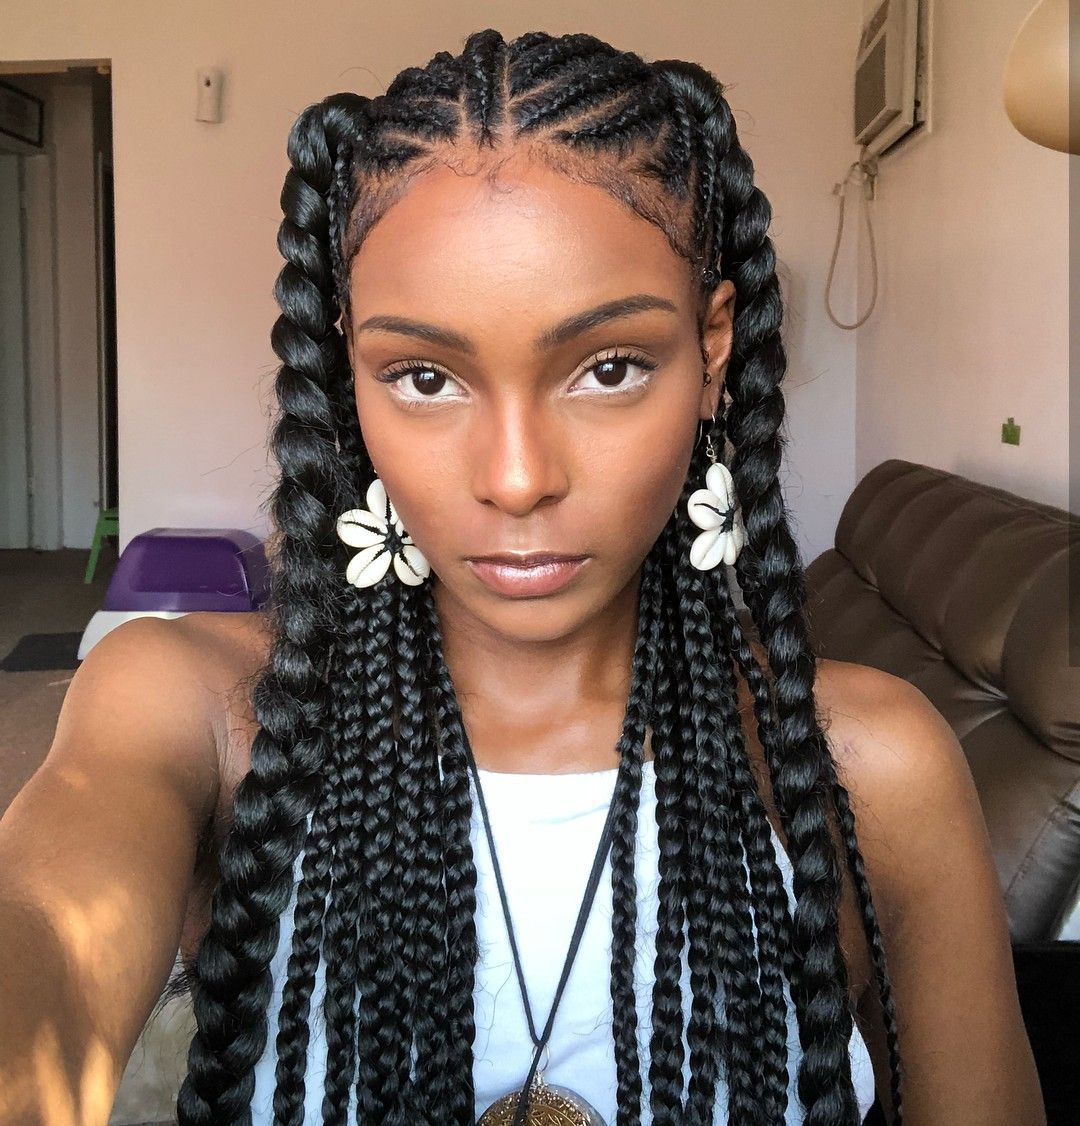 50 African Hair Braiding Styles Ideas For Extra Inspiration Thrivenaija In 2020 African Braids Hairstyles Hair Styles Natural Hair Styles